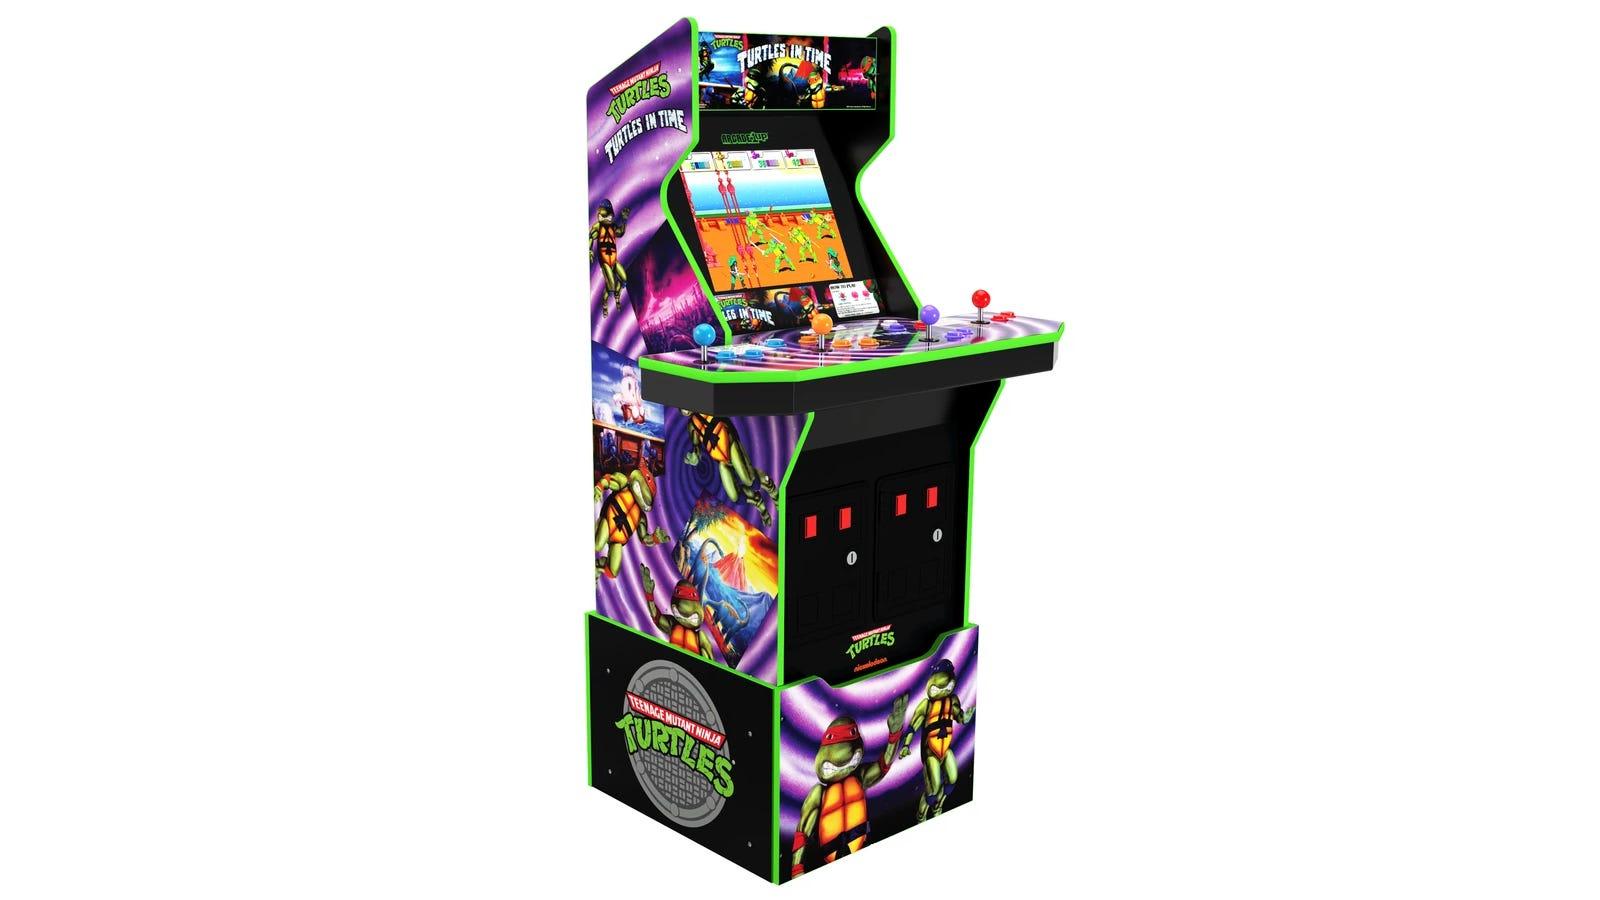 Teenage Mutant Ninja Turtles: Turtles in Time ™ Arcade Machine